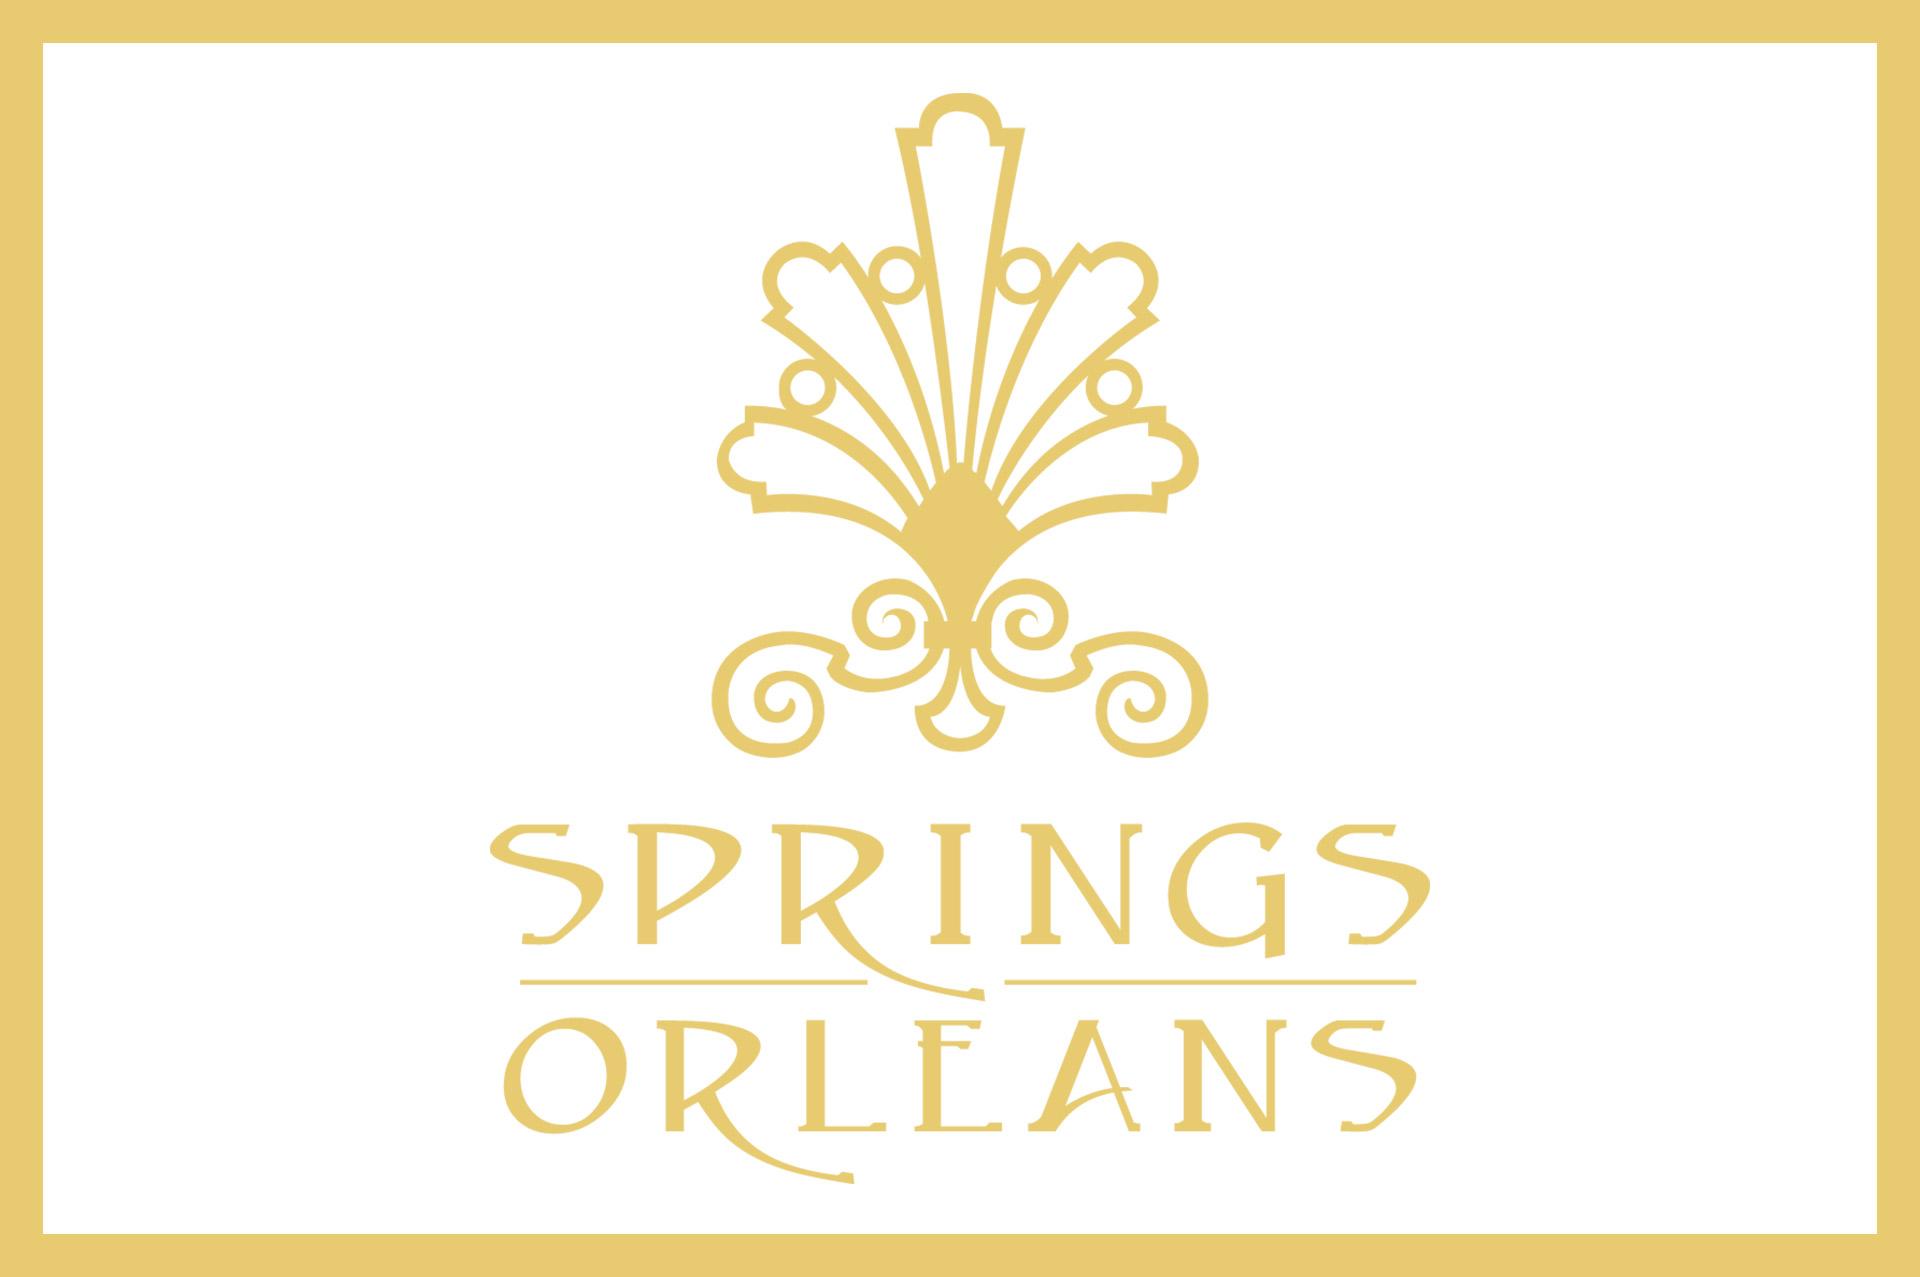 SpringsOrleans